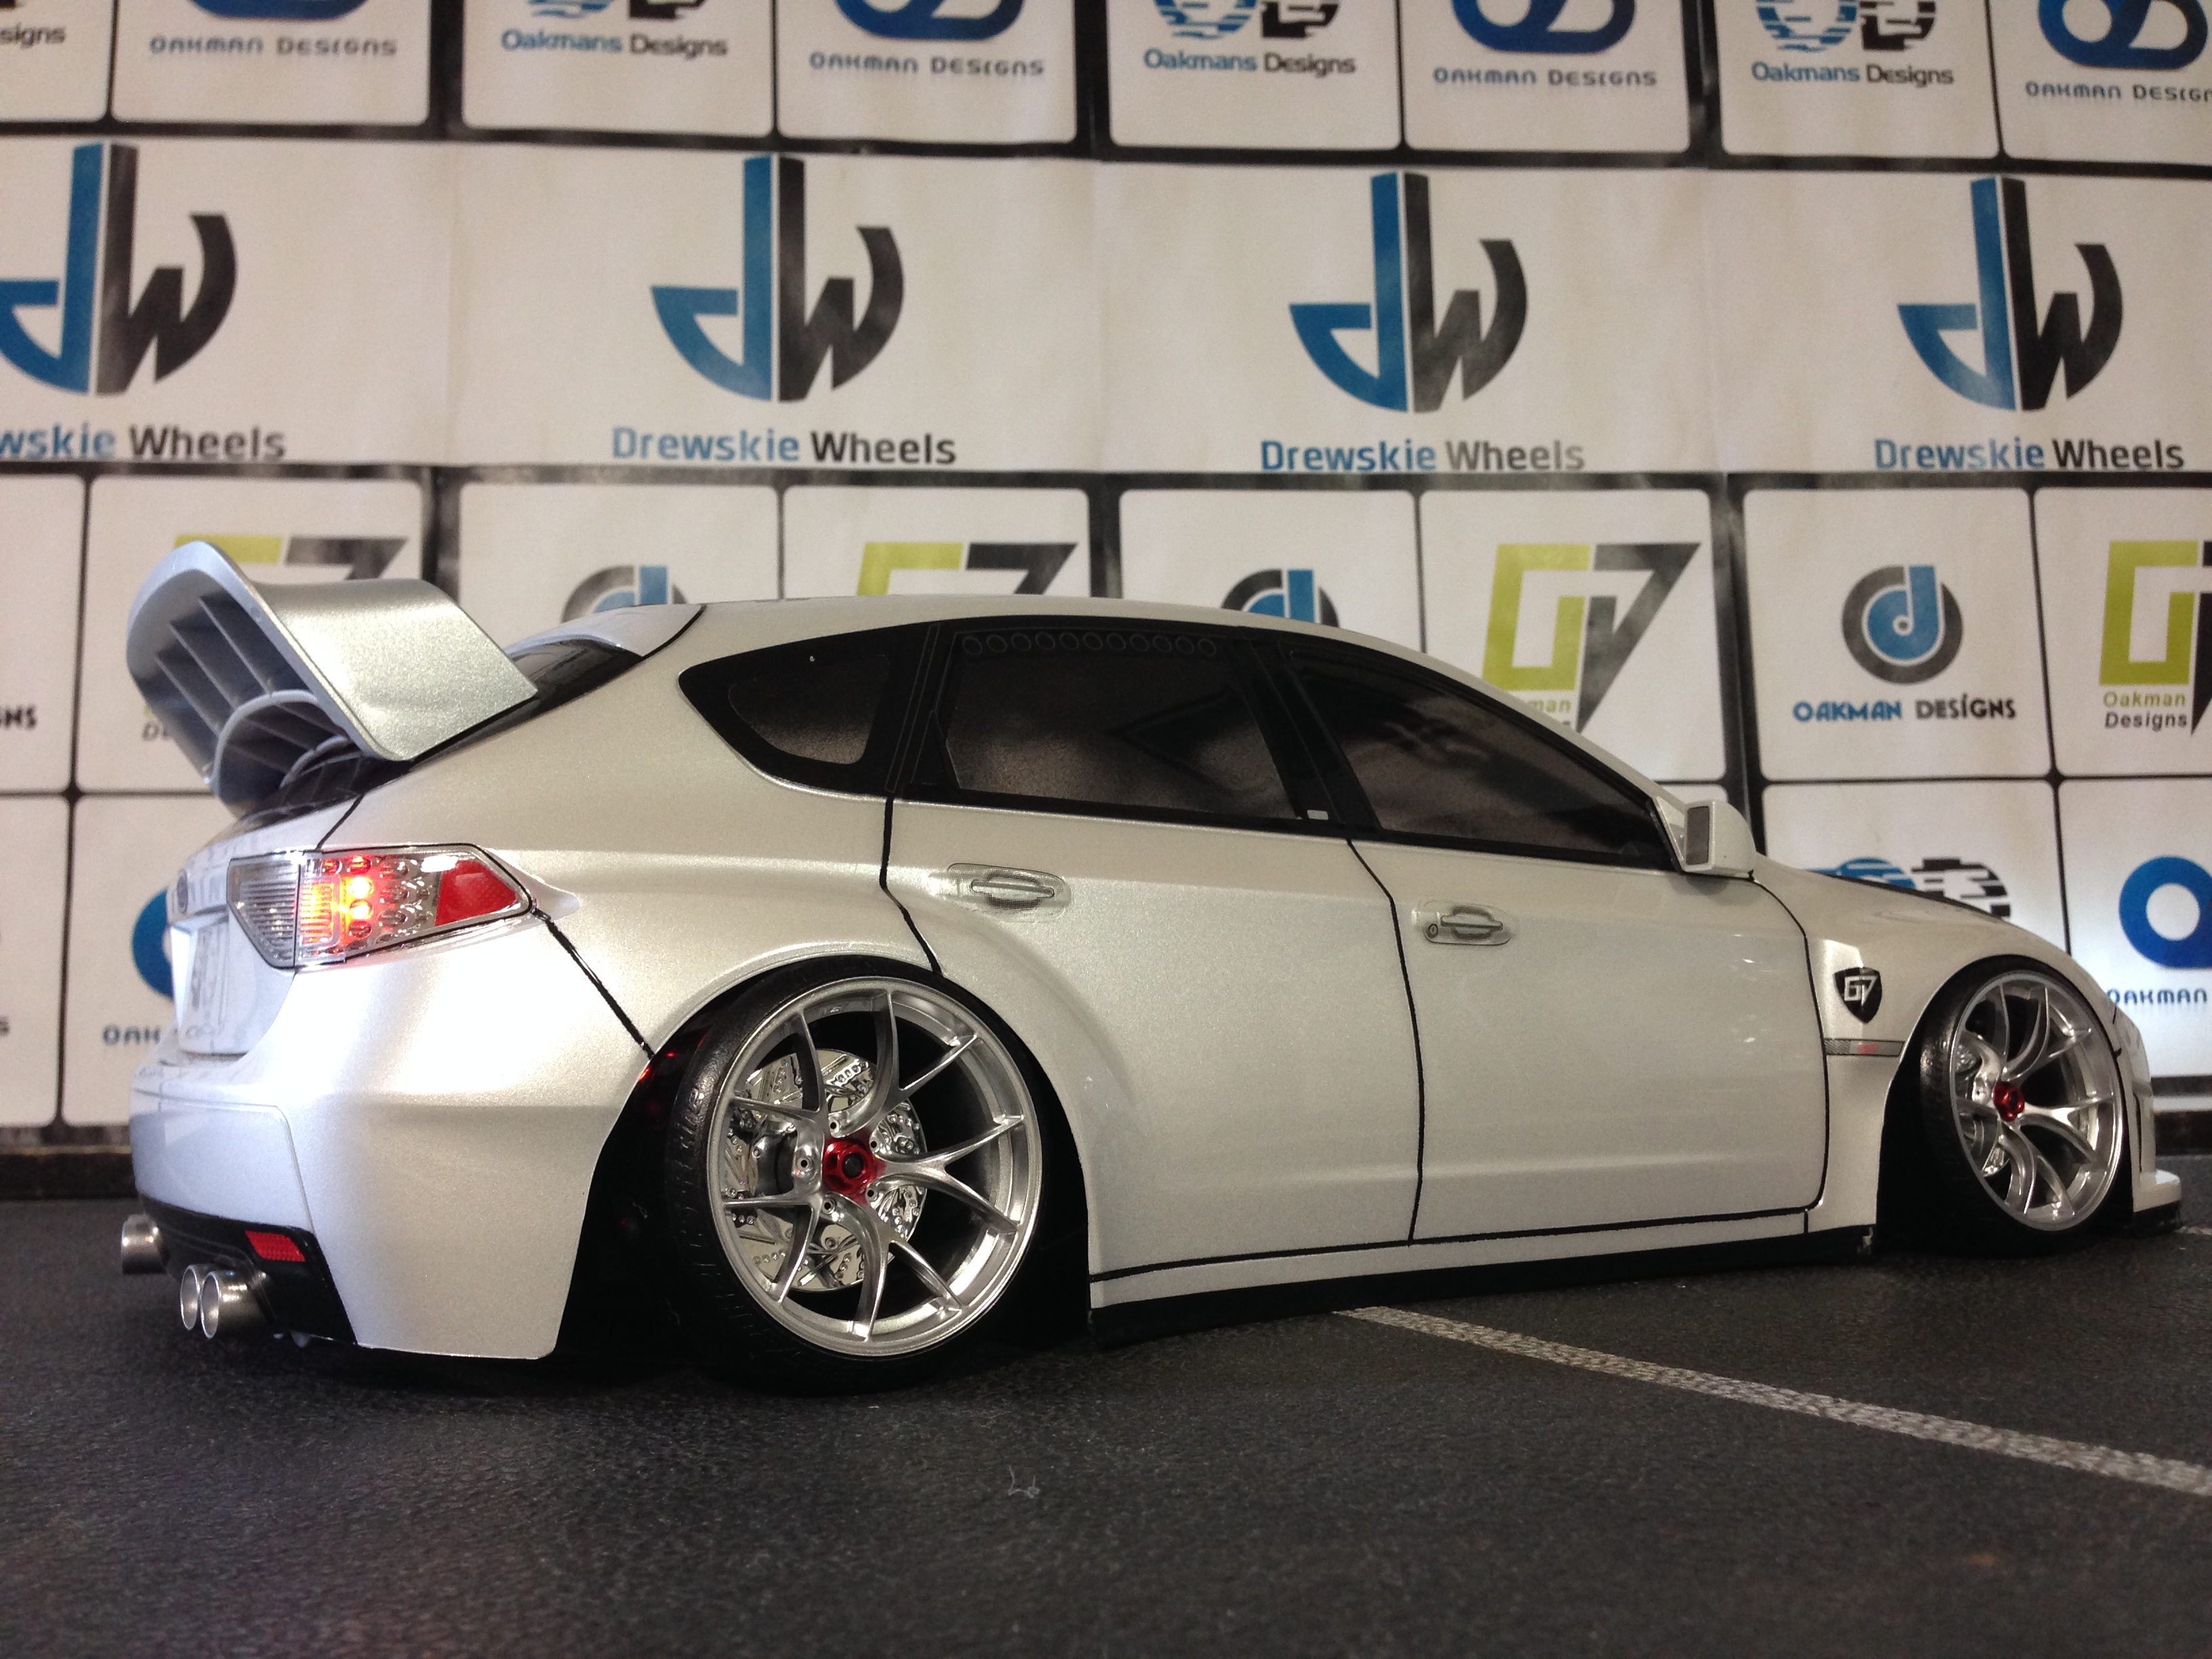 Subaru Impreza Wrx Sti Oak Man Designs